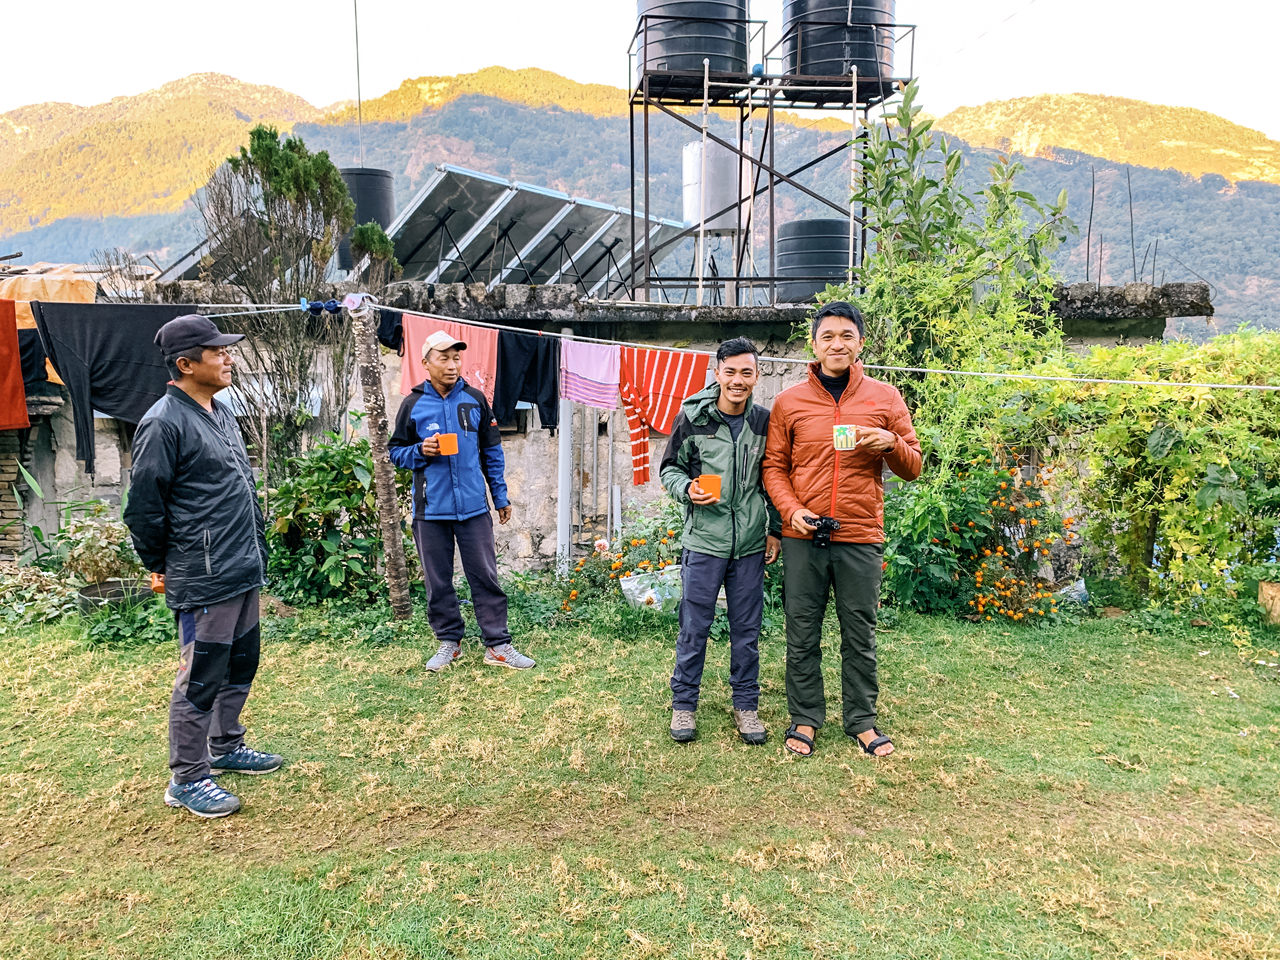 Nepal 2019 - Trekking Annapurna Base Camp 189